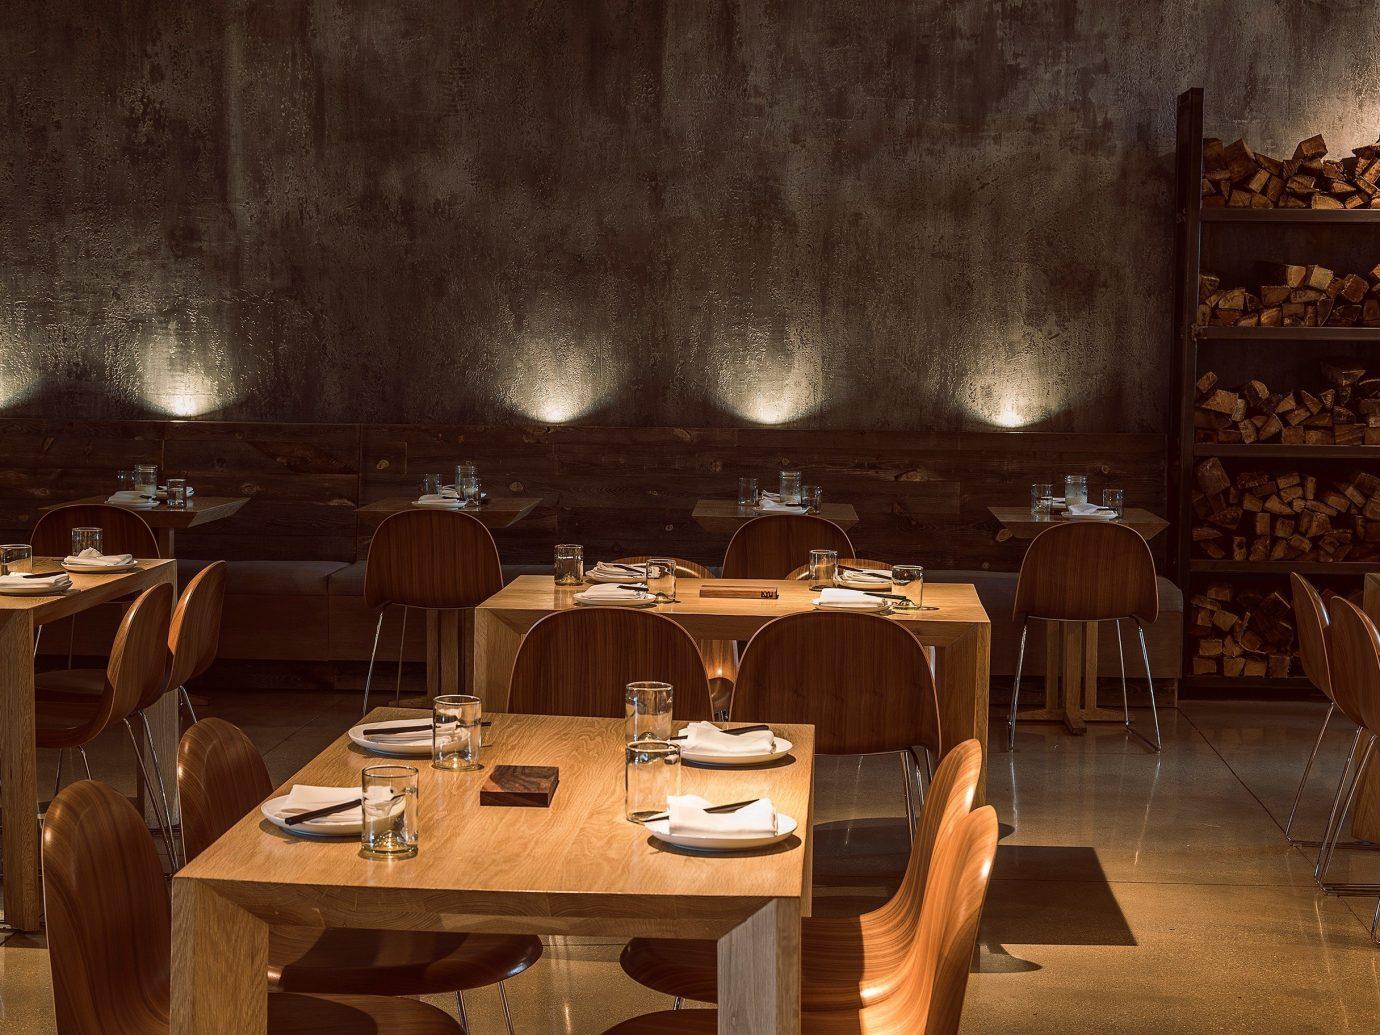 Summer Series floor indoor wall room restaurant interior design meal Bar furniture several